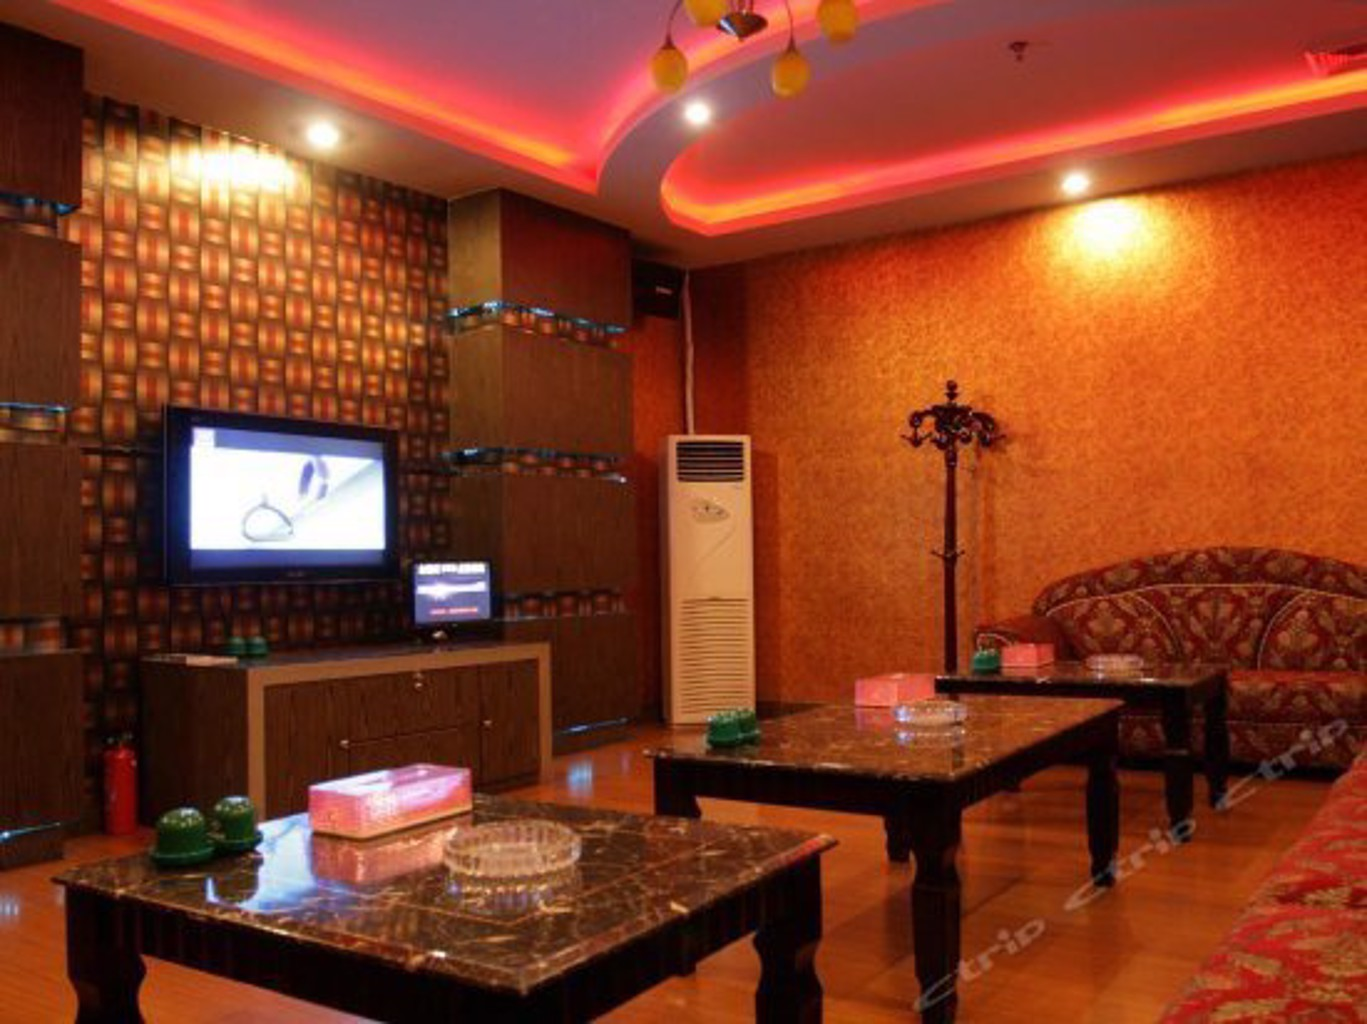 Gallery image of Shell Jiaxing Nanhu District Dongsheng Dong Road Moon River Street Hotel